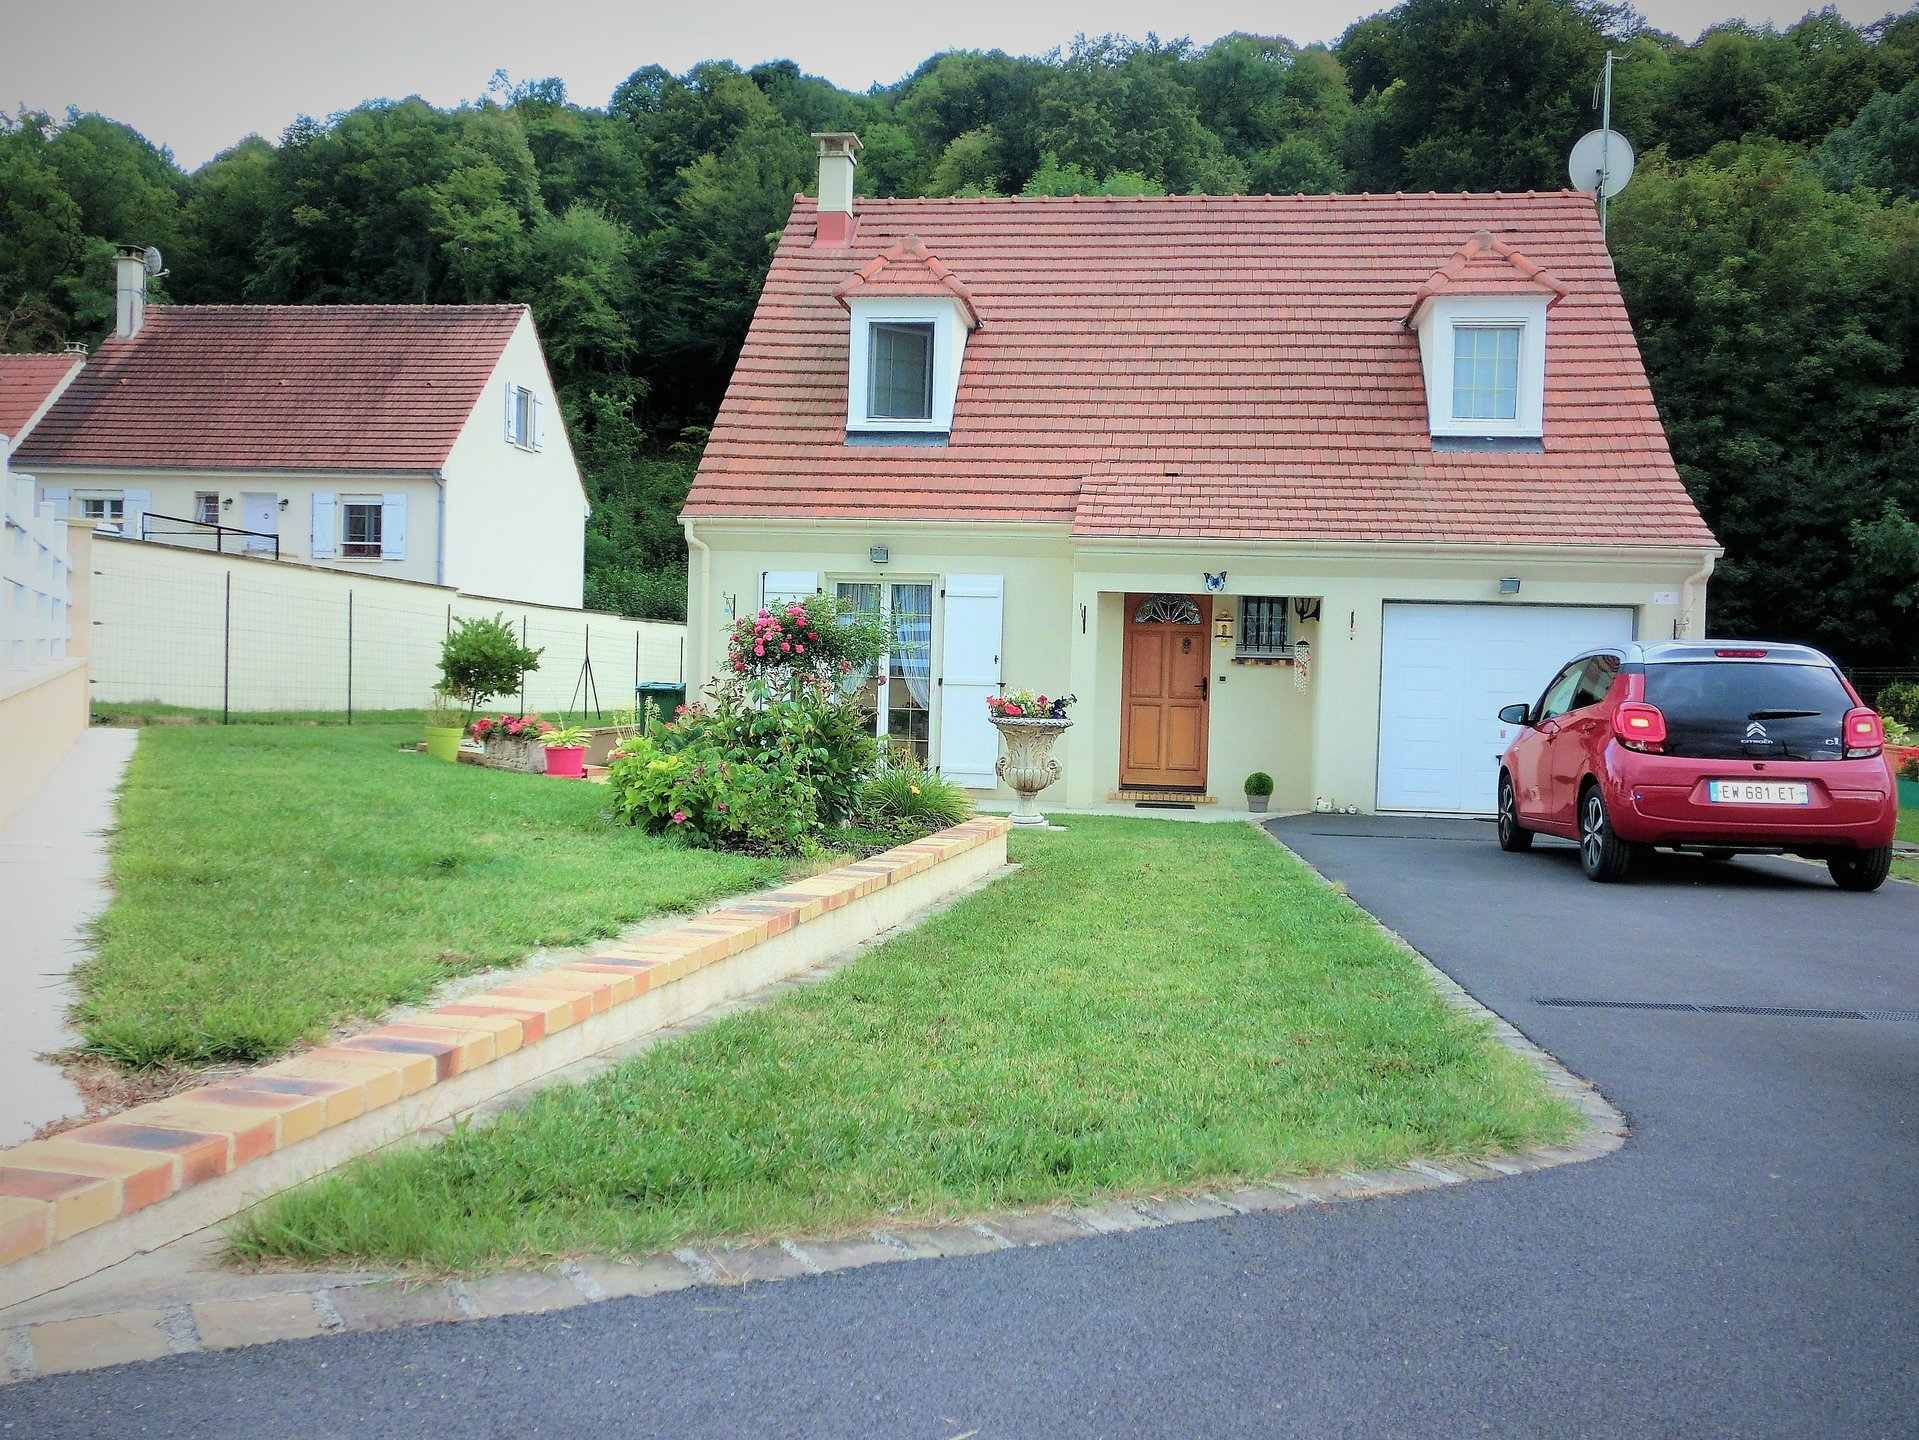 Maison - Proche chantilly - 270 000 € FAI